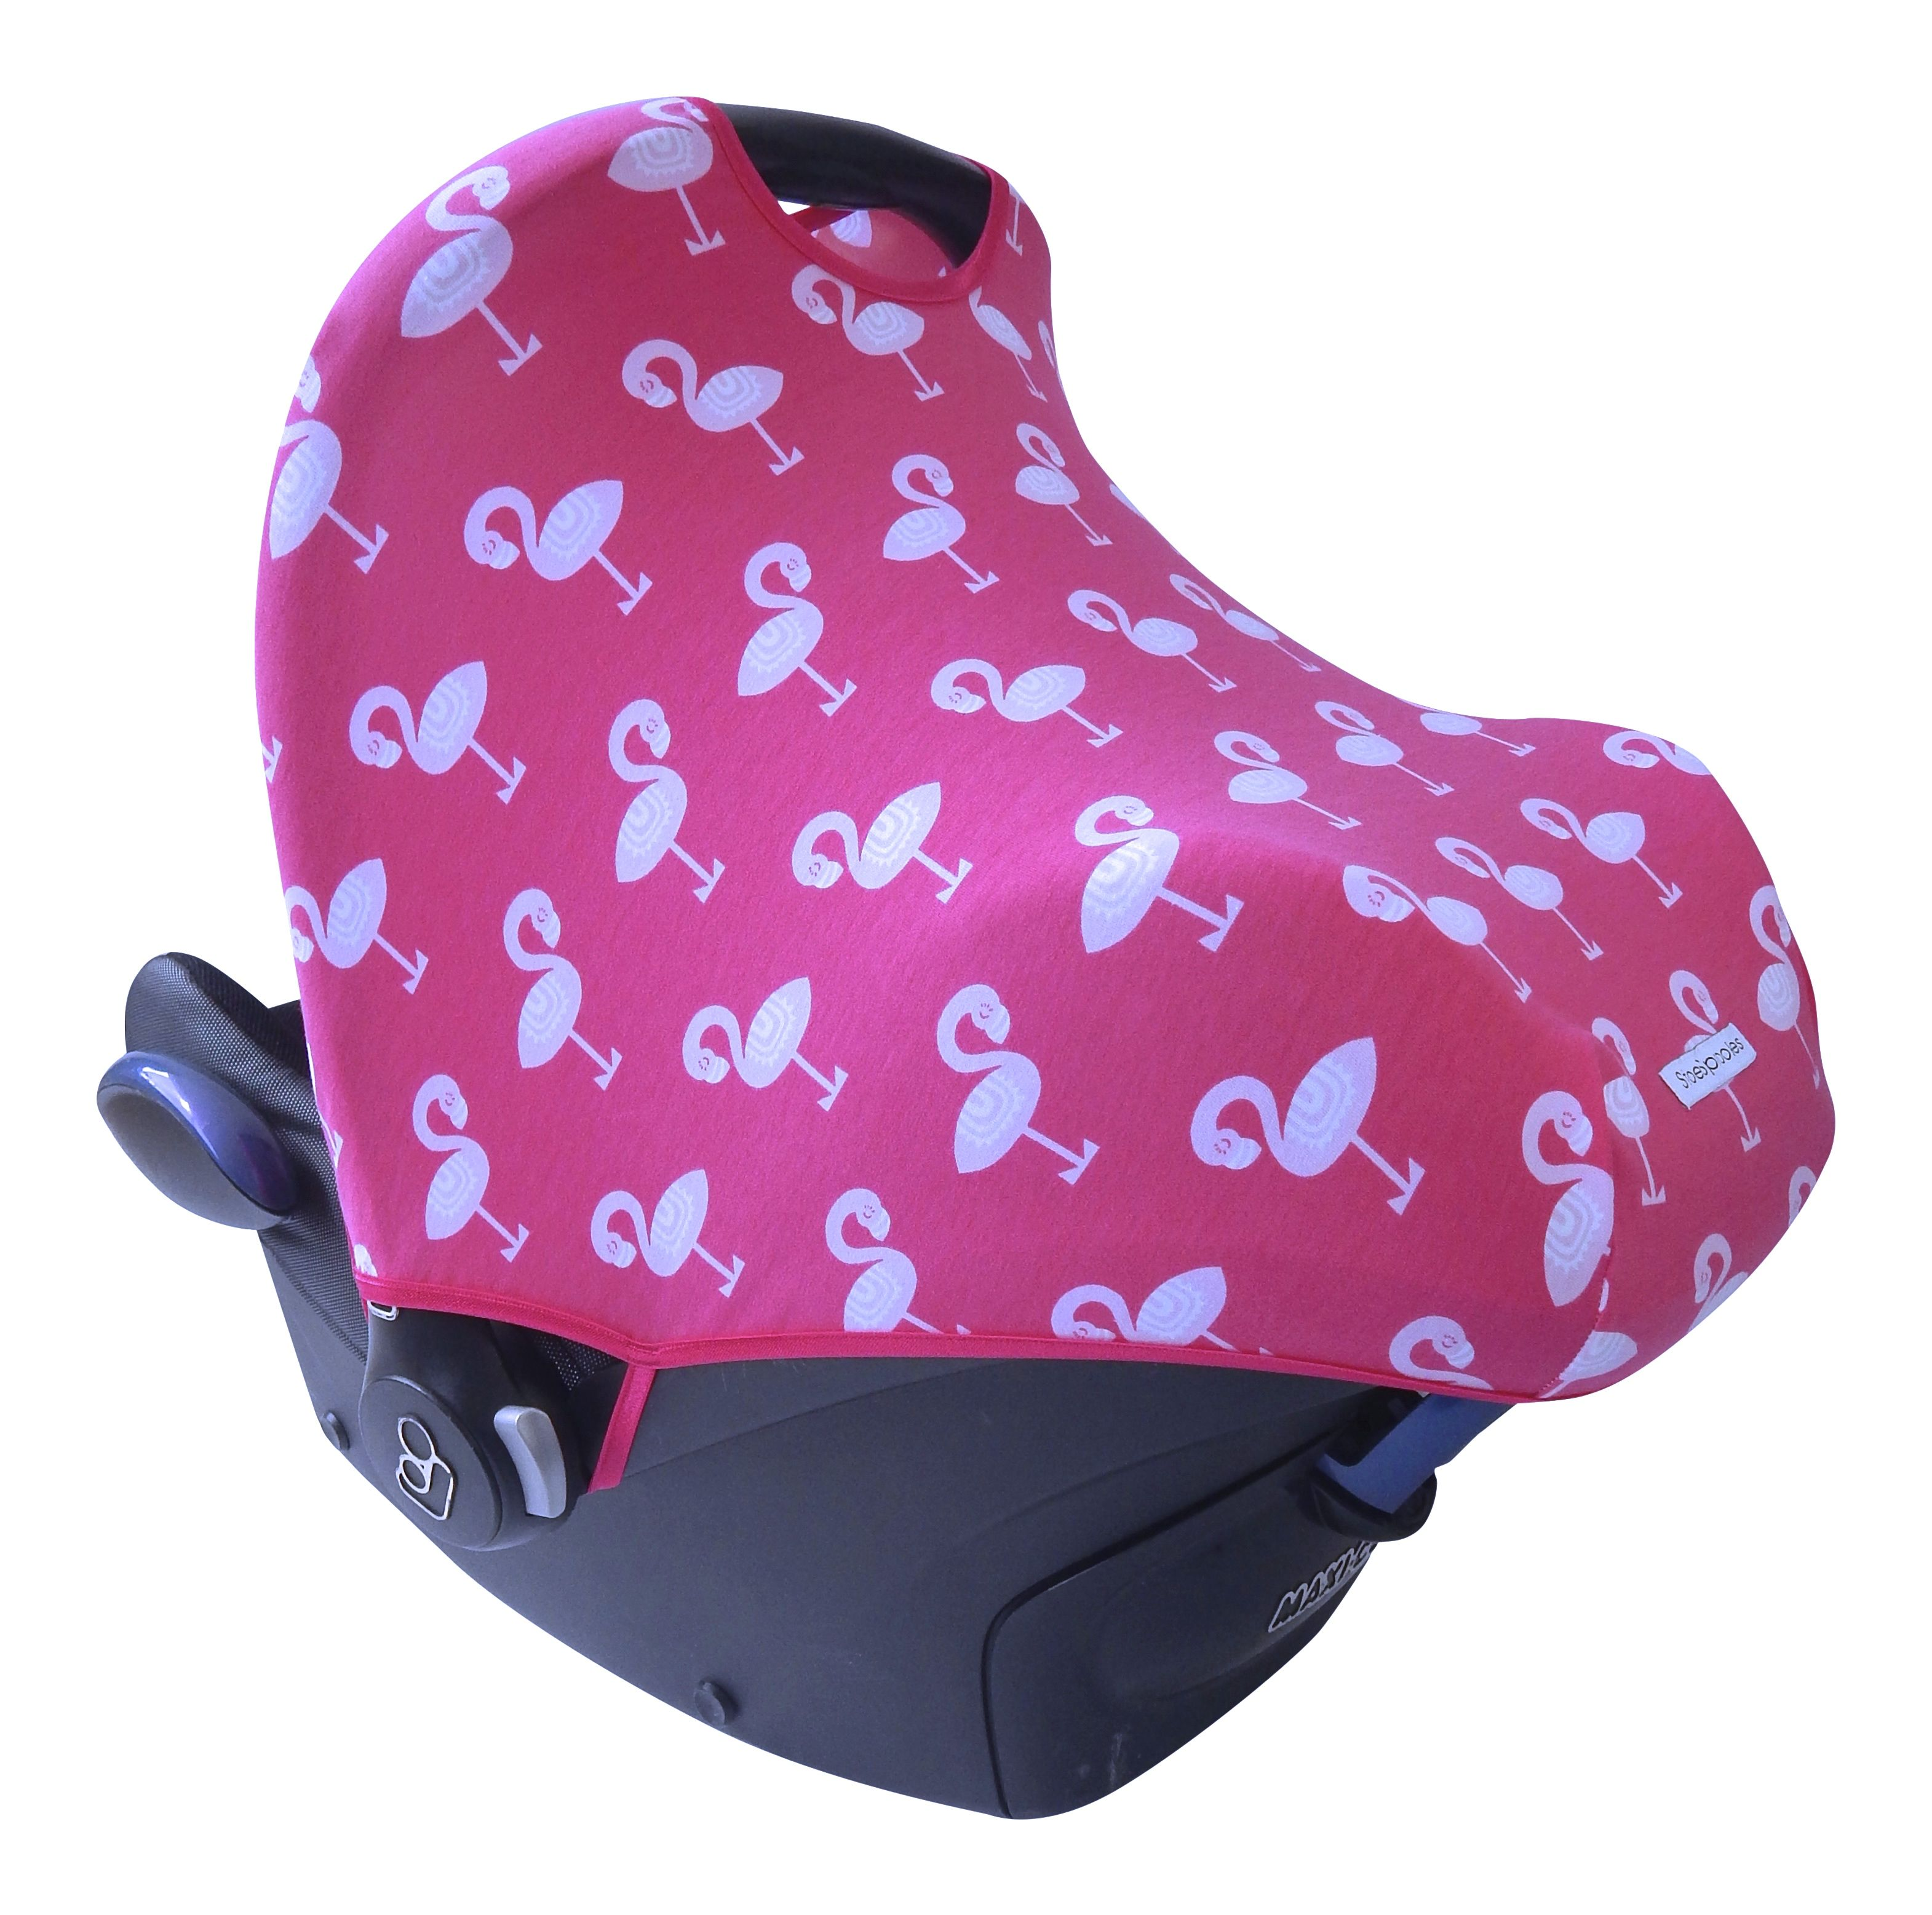 Maxi Cosi zonnekap Flamingo Fuchsia car seat cover sun hood canopy boat pink